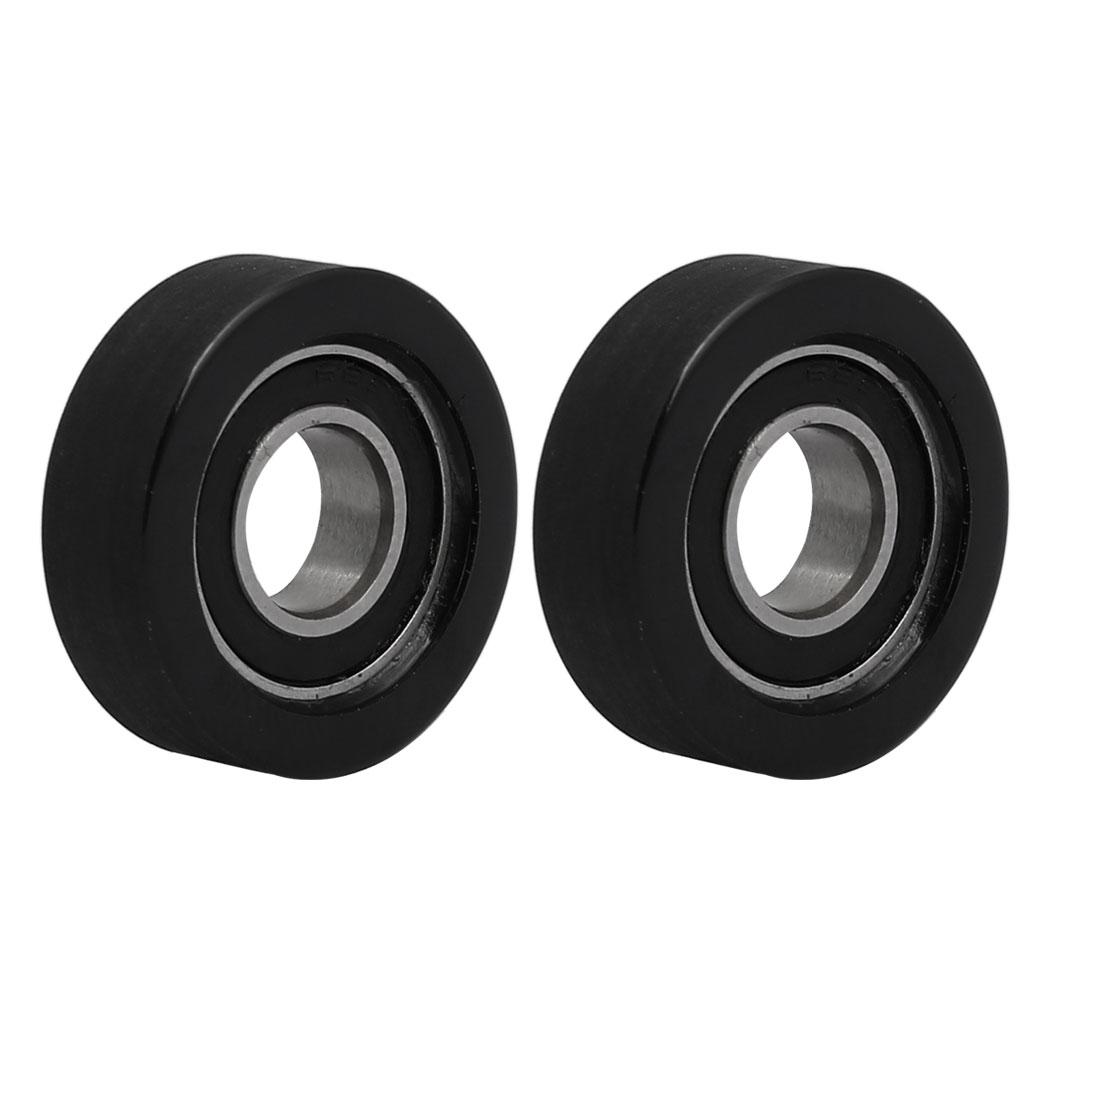 8mmx22mmx7mm PU68822-7 Roller Bearing Pulley Sliding Converyor Wheel Black 2pcs